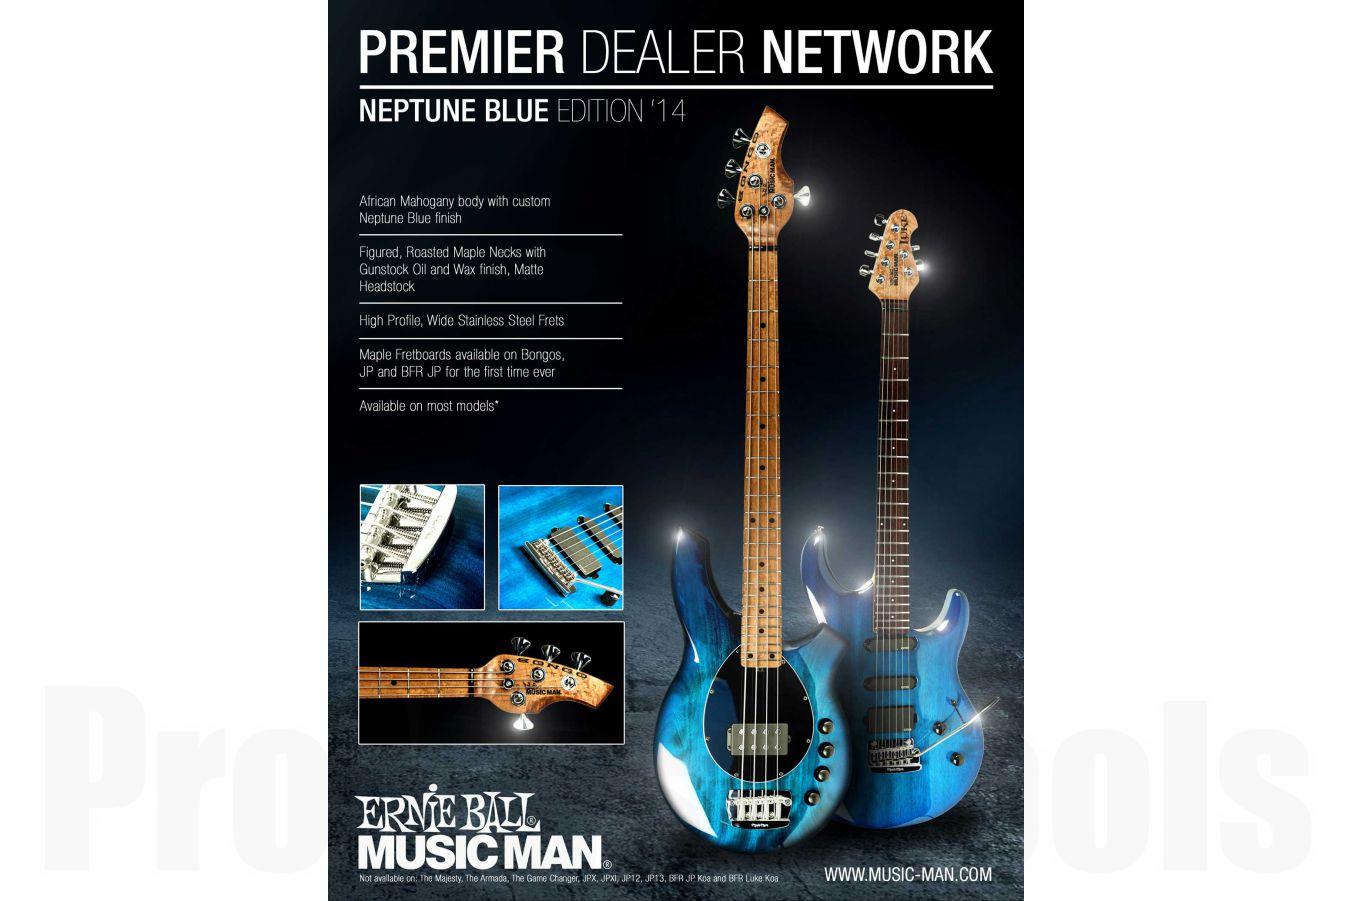 Music Man USA John Petrucci JP6 Piezo NB - PDN Neptune Blue Roasted Neck Limited Edition RW